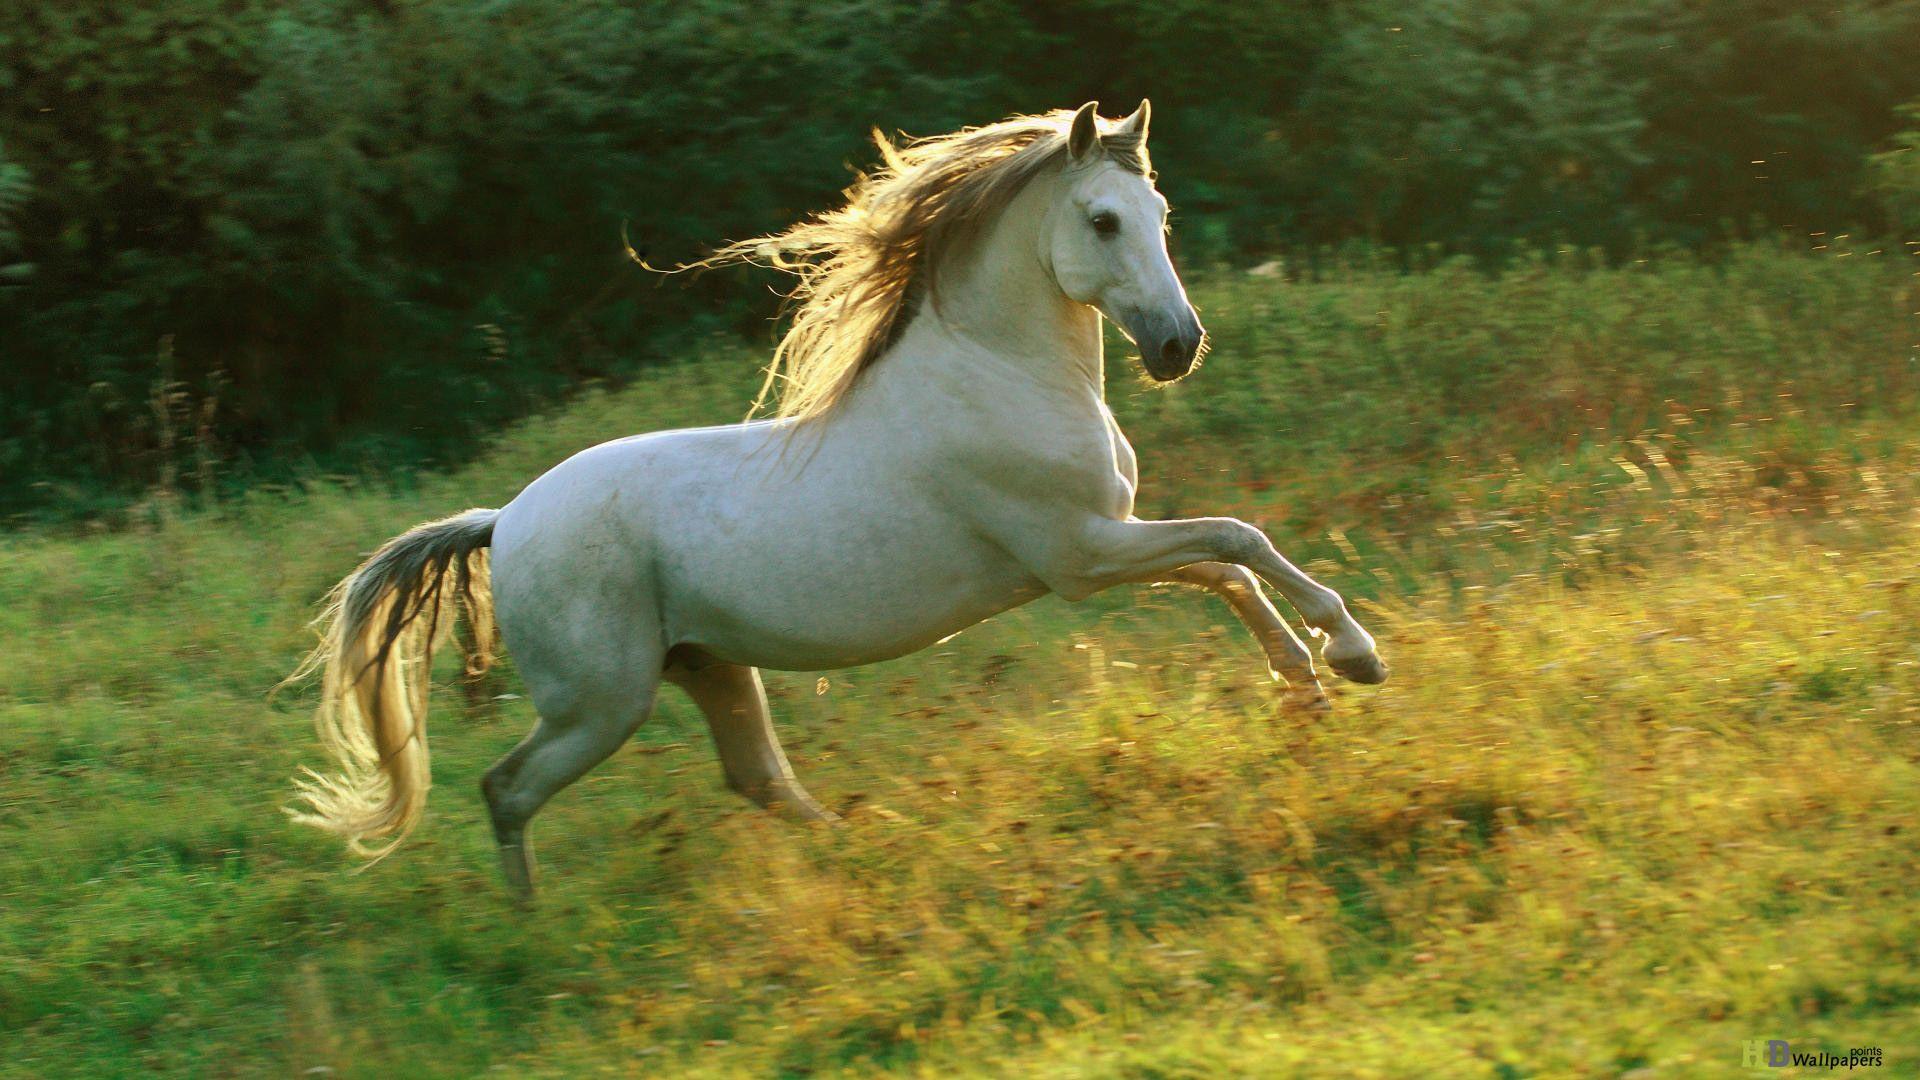 Running Horse Wallpaper Hd 1080p Jpg 1 920 1 080 Pixels Horses Horse Wallpaper Andalusian Horse